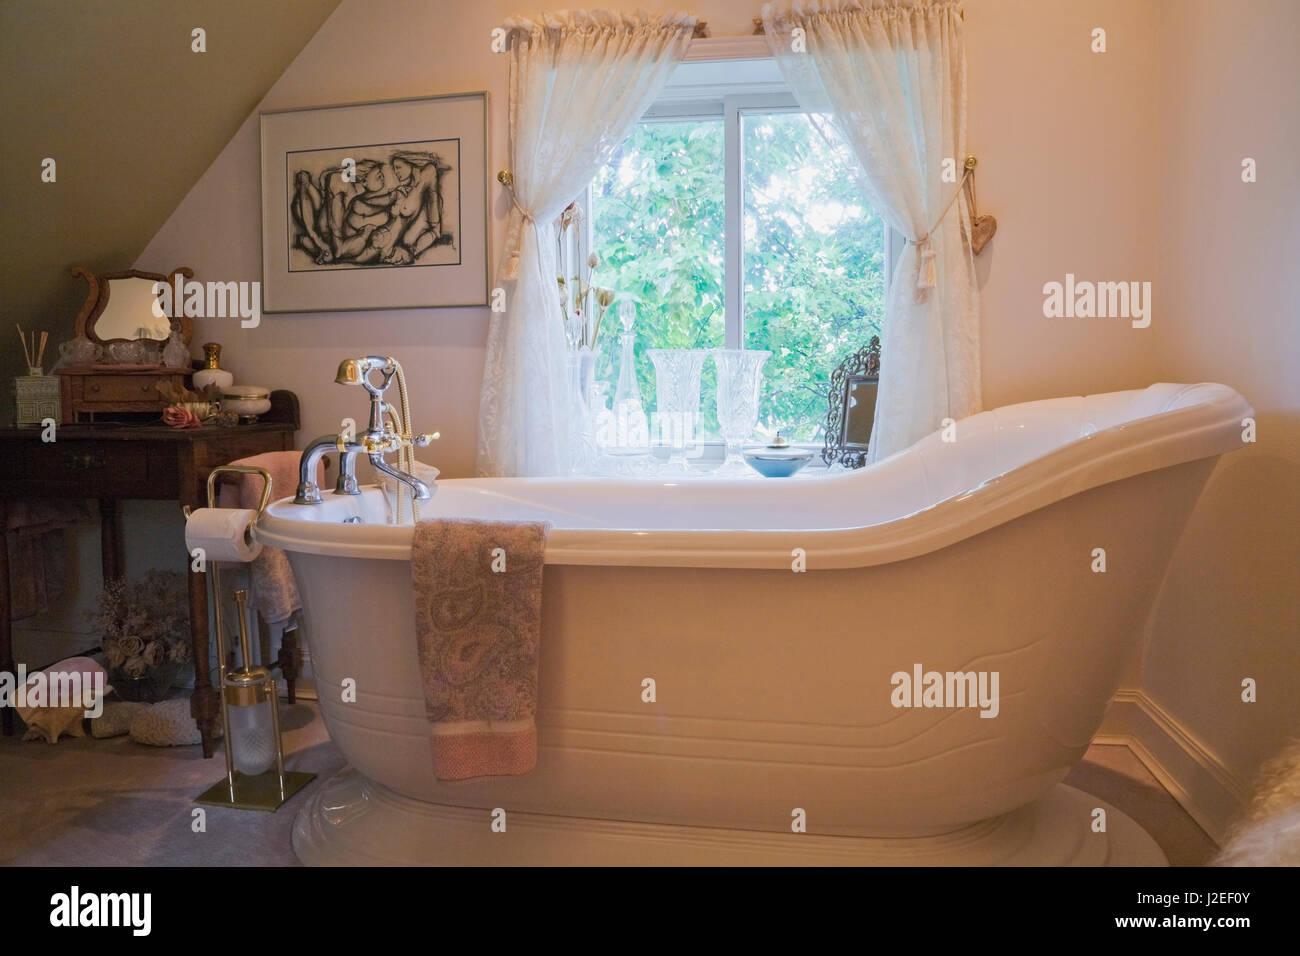 Vasca Da Bagno Antica : Antica vasca da bagno in lamiera zingata eur picclick it